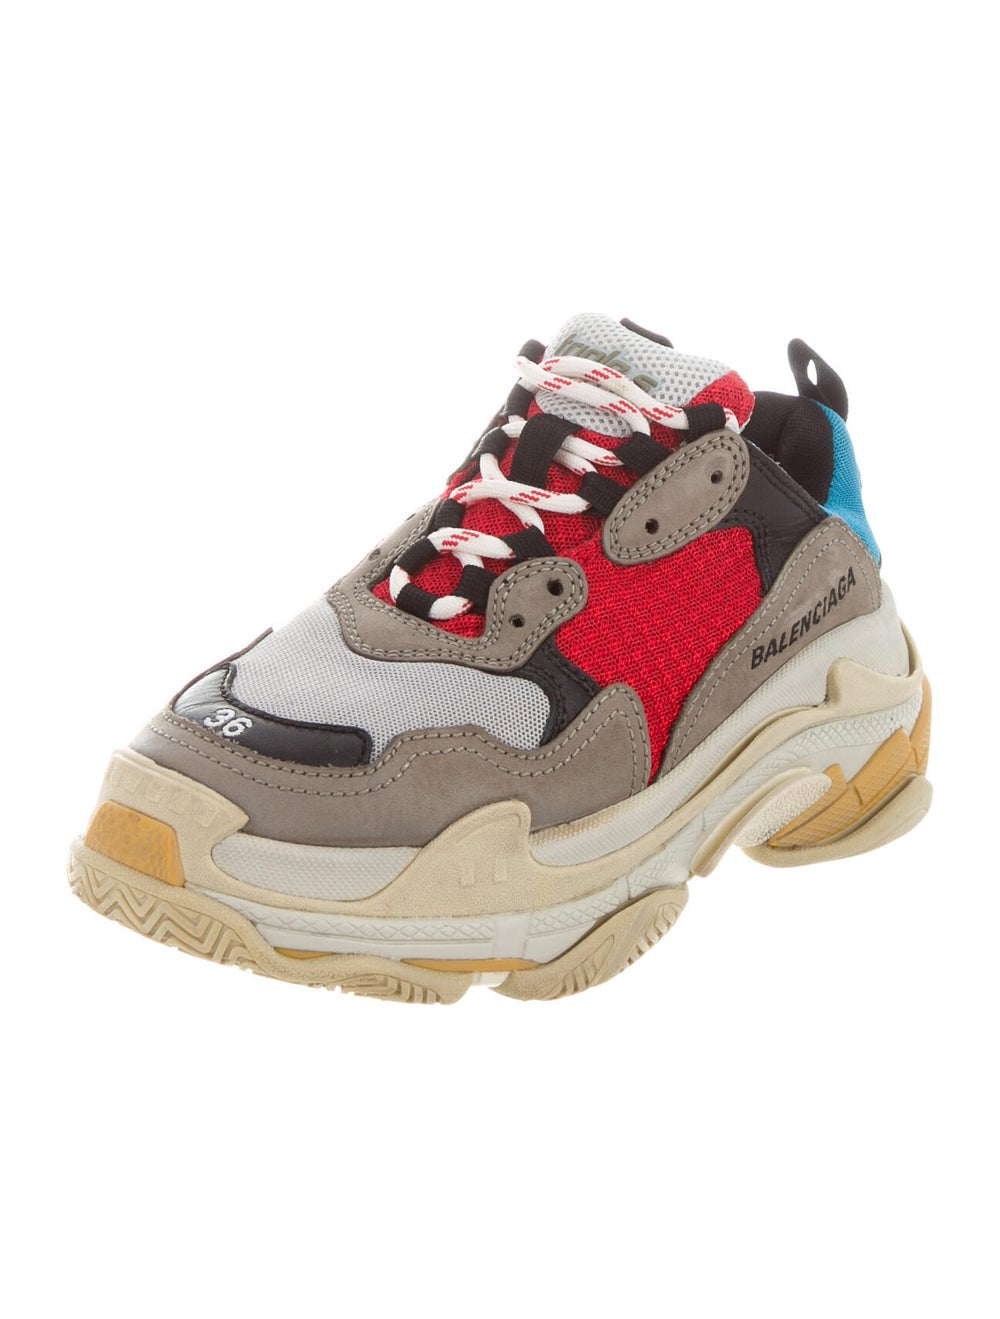 Balenciaga Colorblock Pattern Chunky Sneakers Grey - image 2